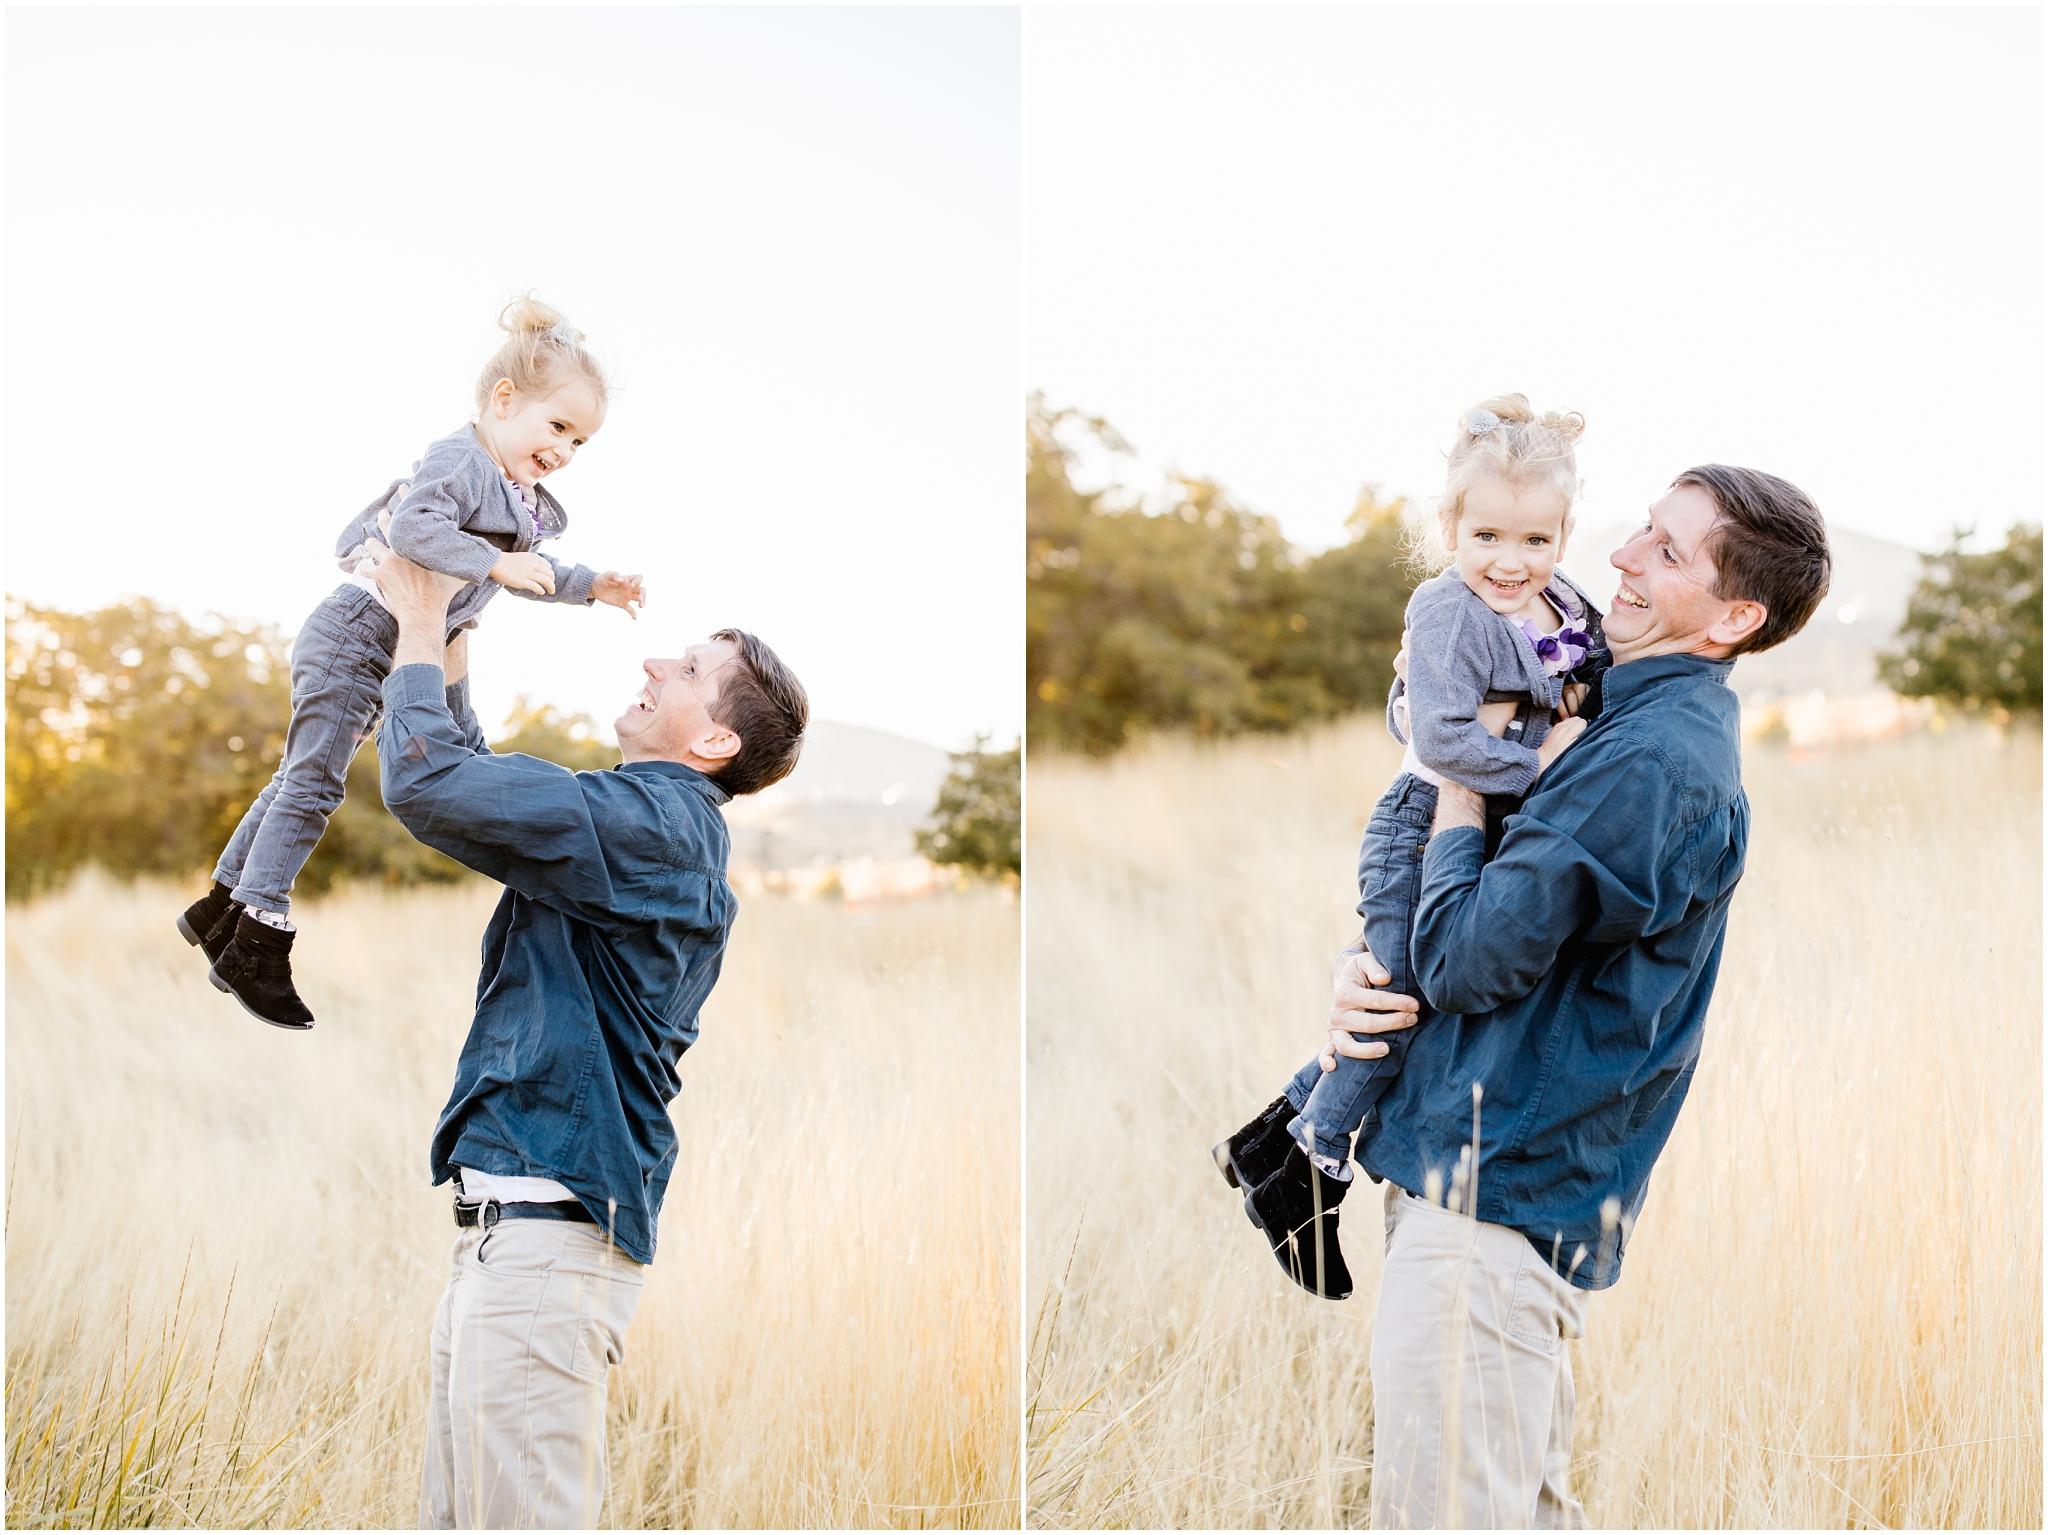 Jaursch-91_Lizzie-B-Imagery-Utah-Family-Photographer-Salt-Lake-City-Park-City-Herriman-Utah-County.jpg